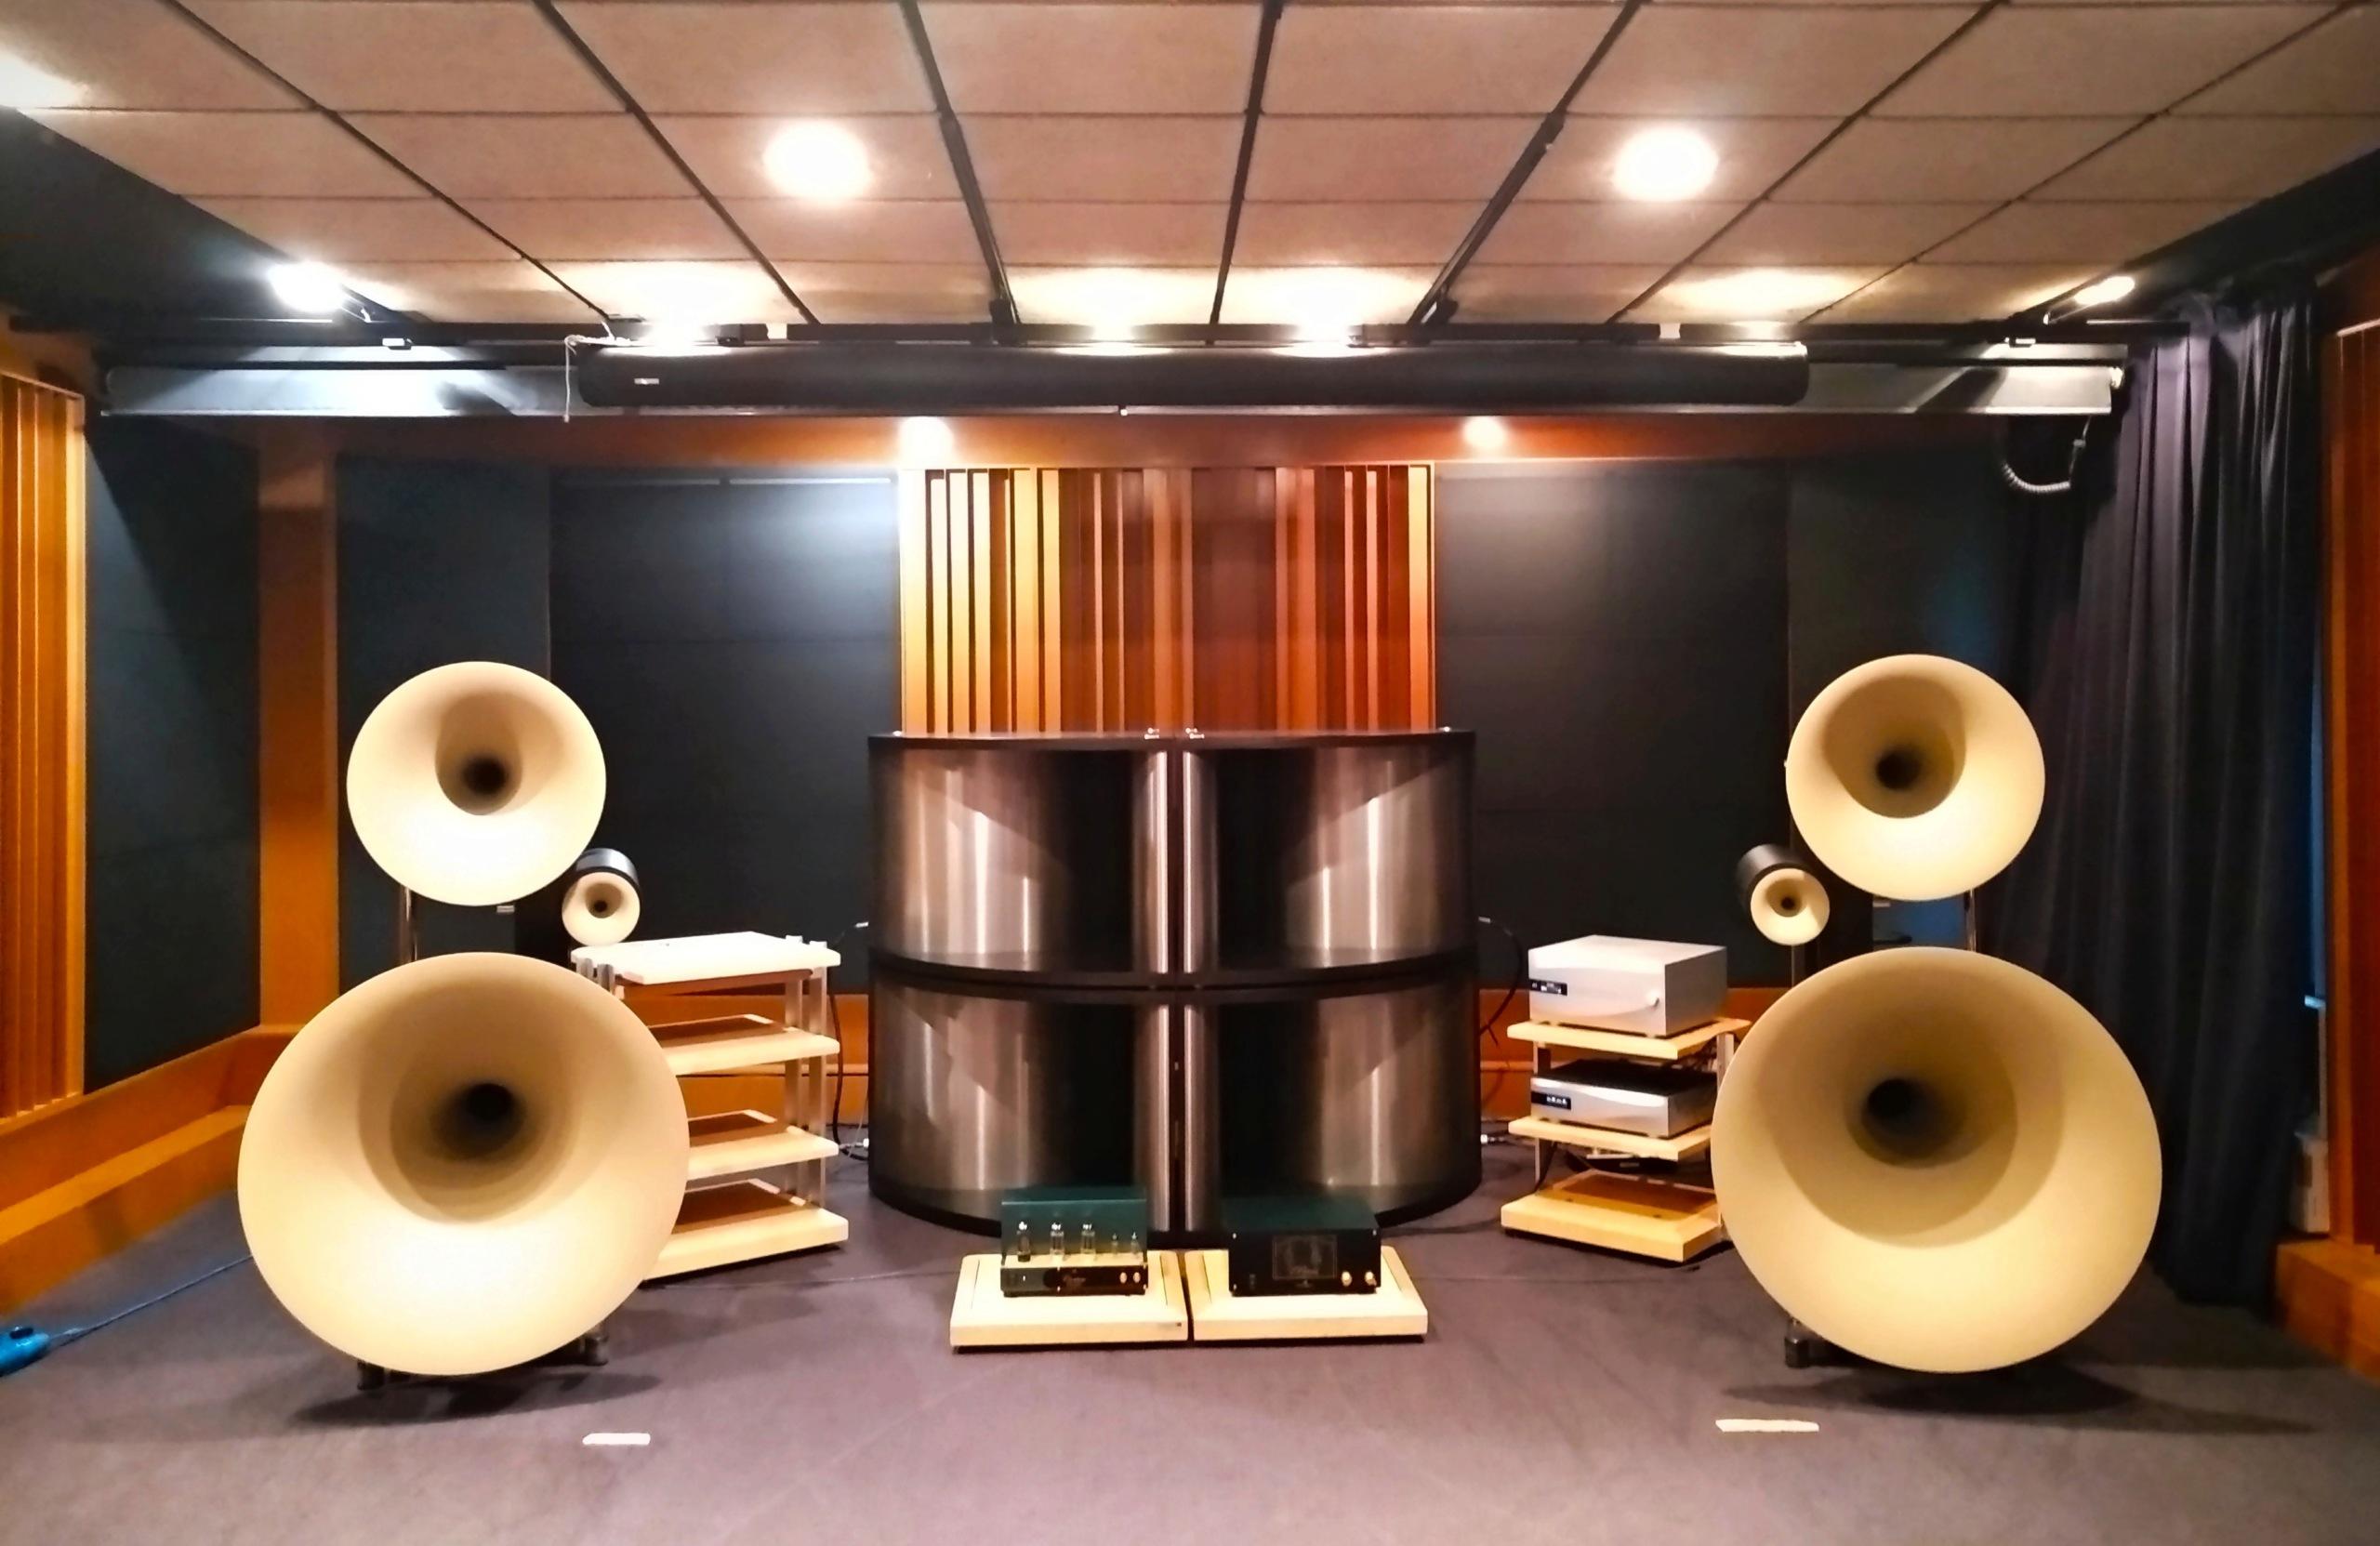 Salas audiofilas - Página 2 Img_2047